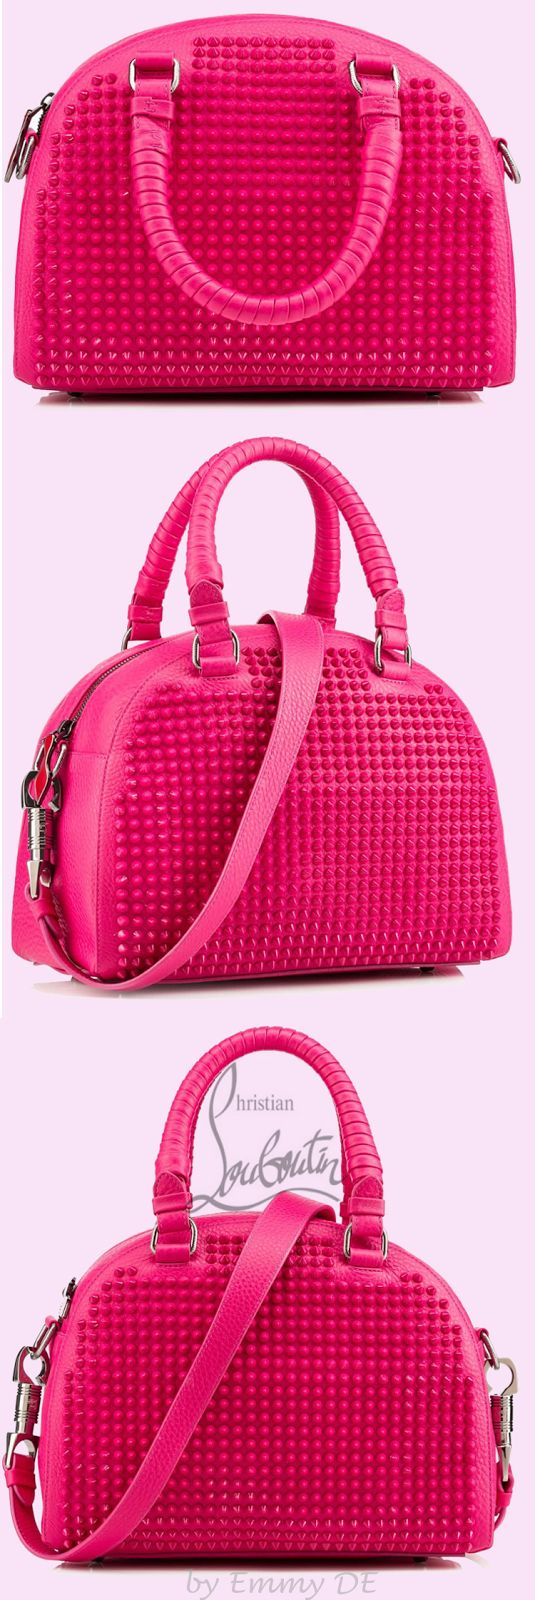 Christian Louboutin ~  'Panettone' Spring Leather Handbag 2015